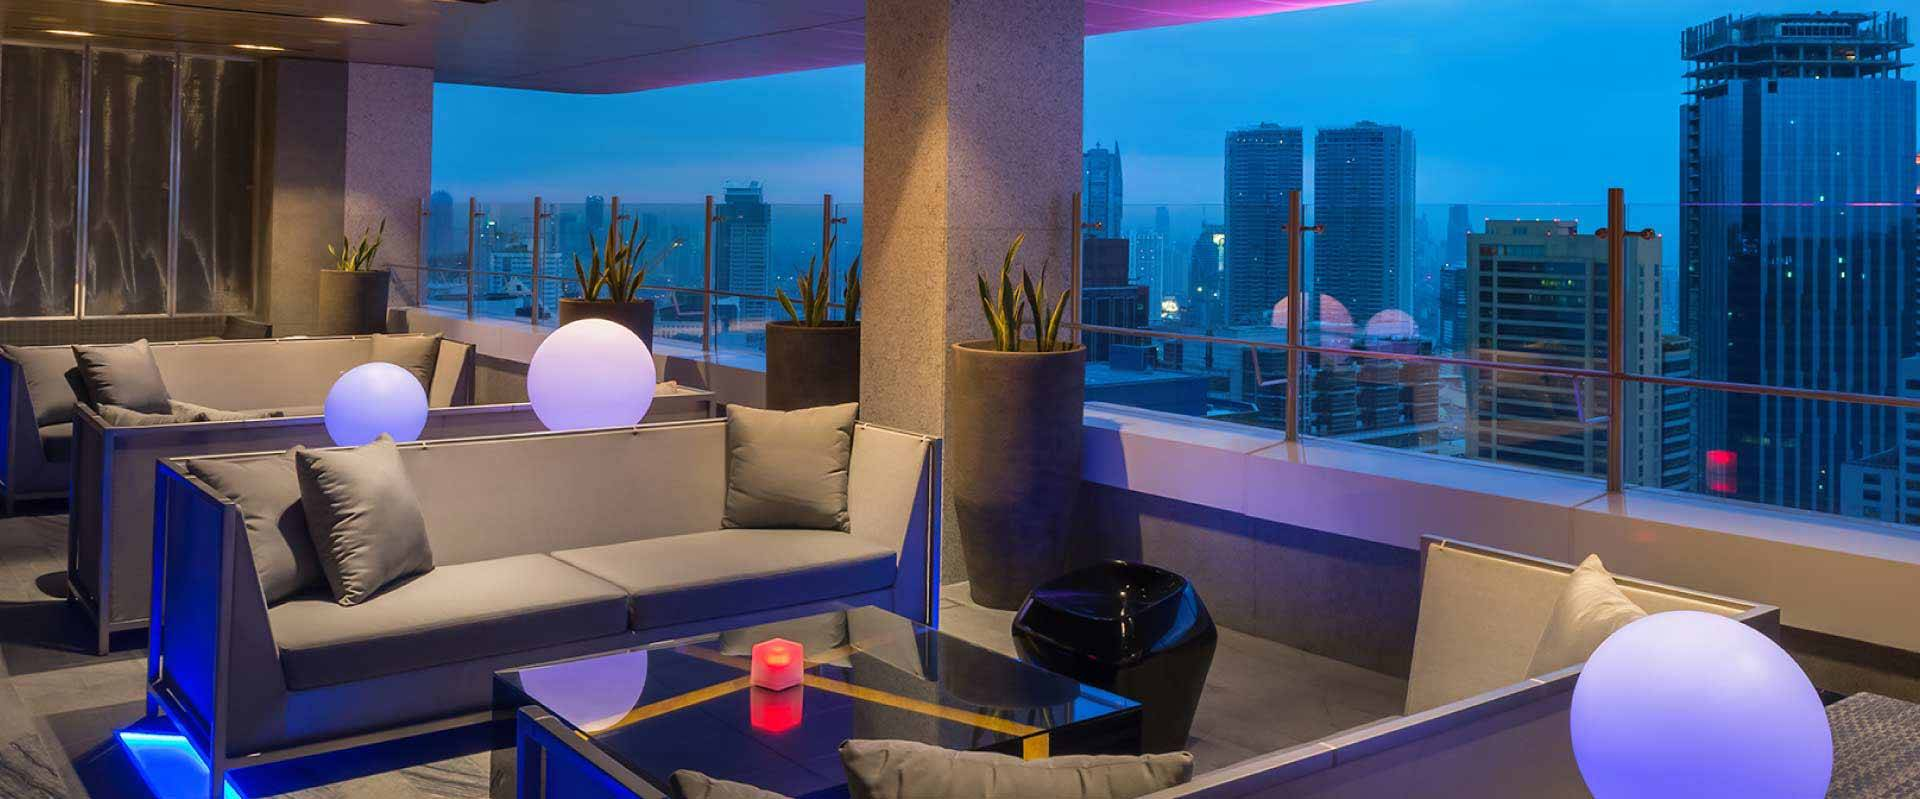 Vus Sky Bar And Lounge Restaurants Amp Bars Marco Polo